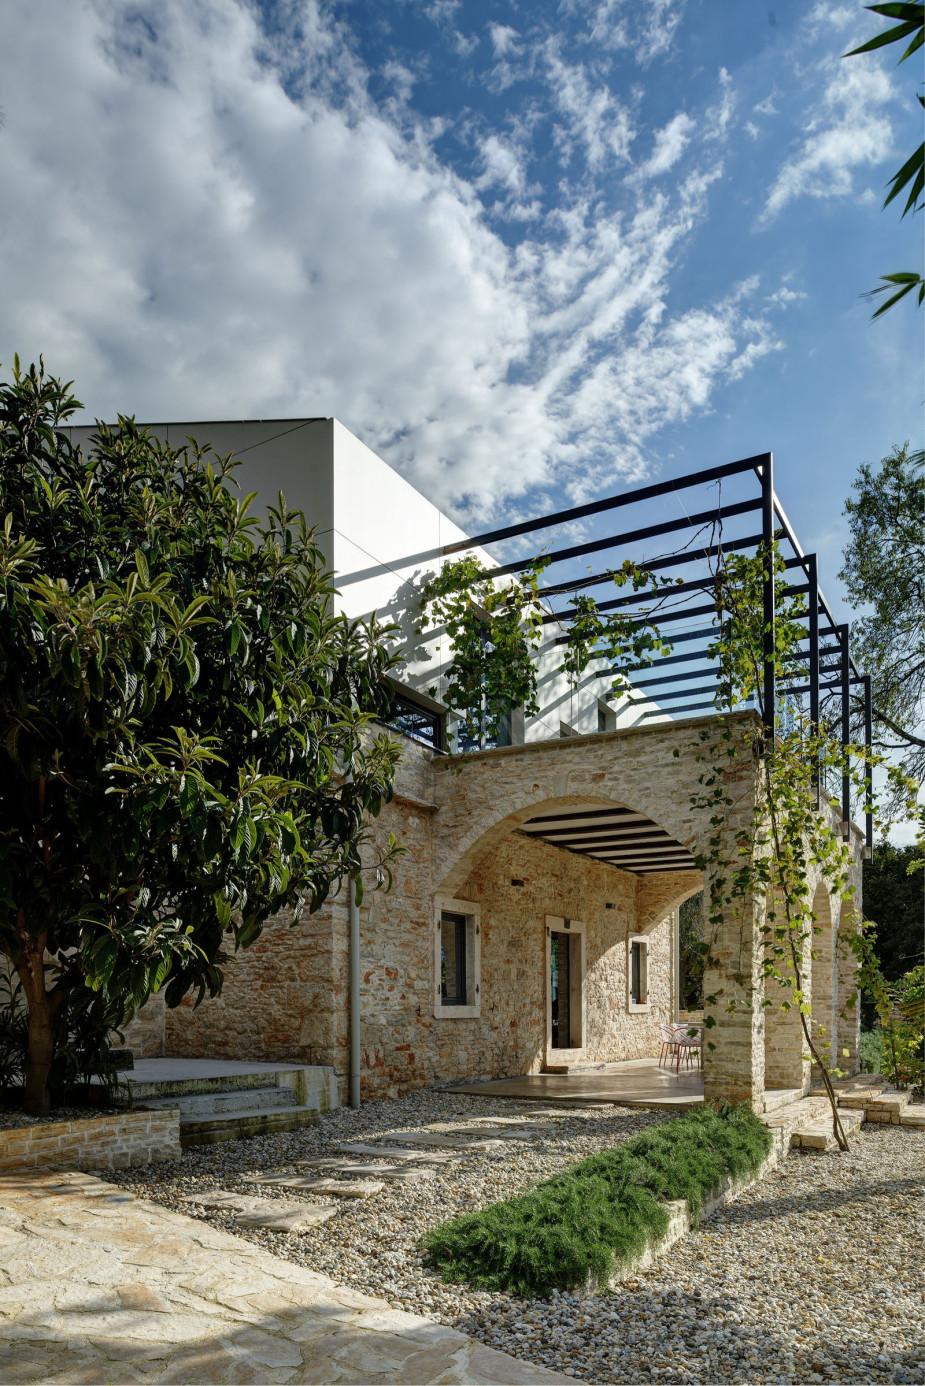 Mediterranean Villa In Ancient Croatian Town